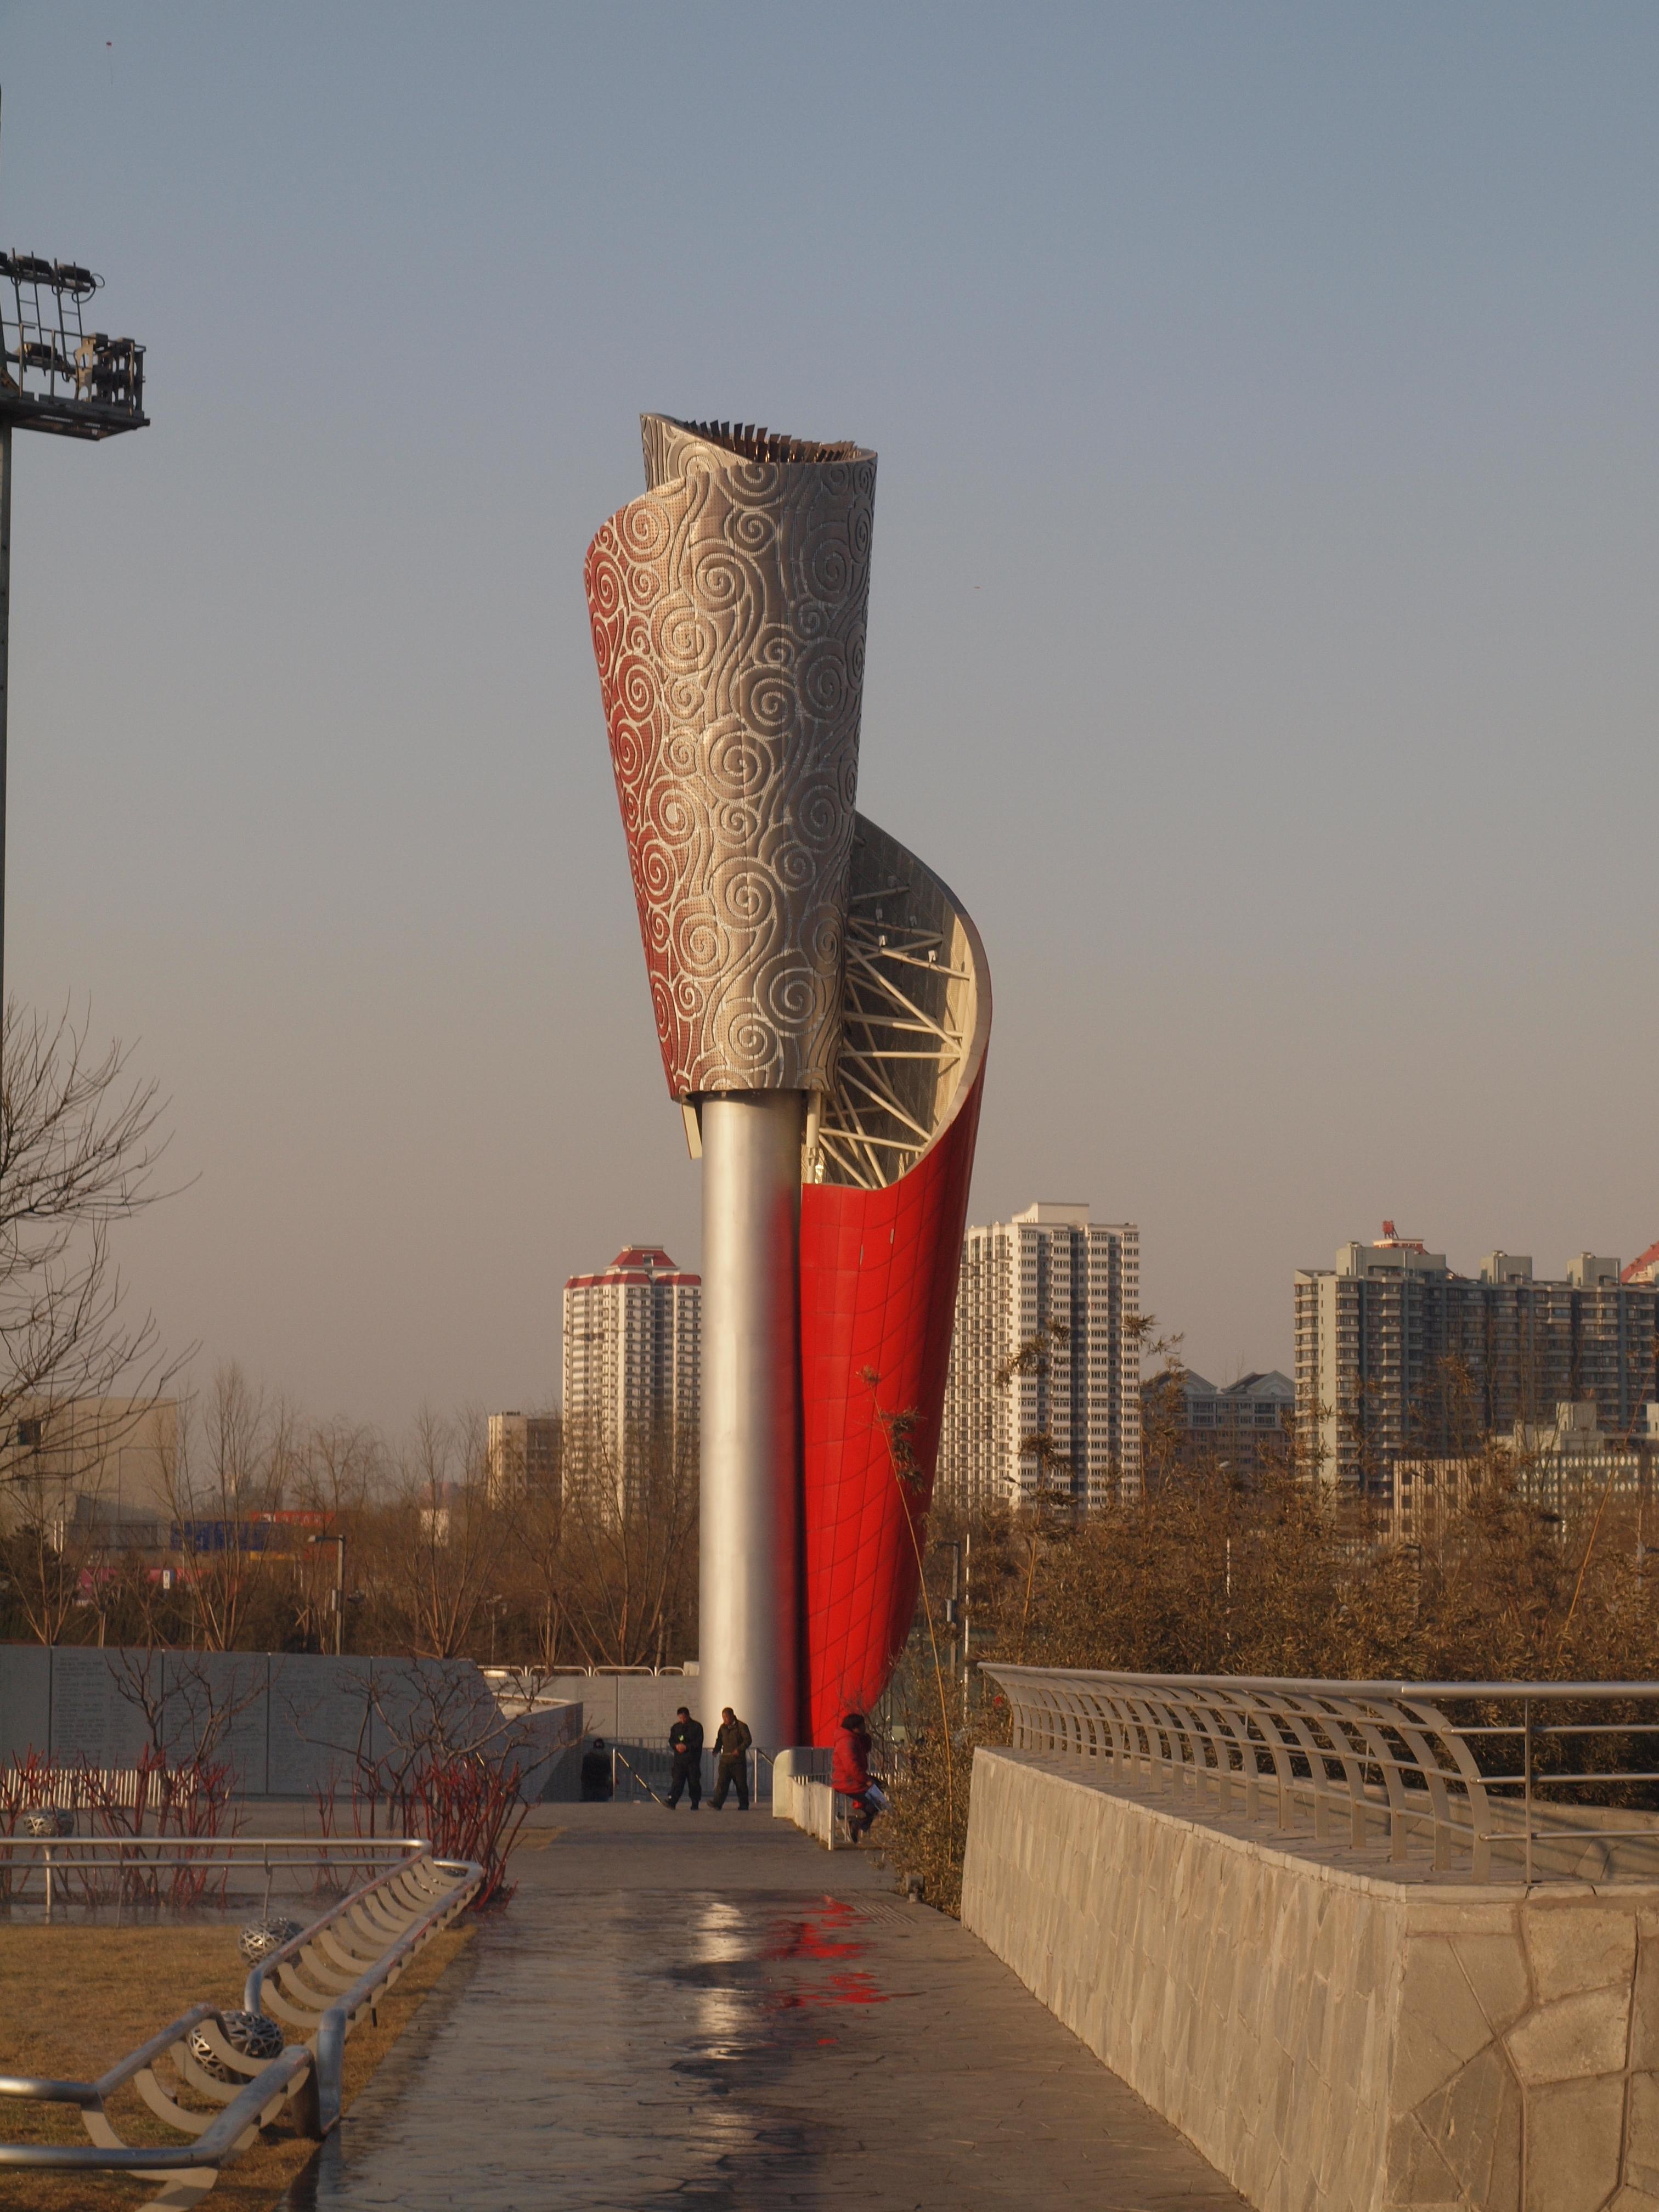 2008 Summer Olympics medal table